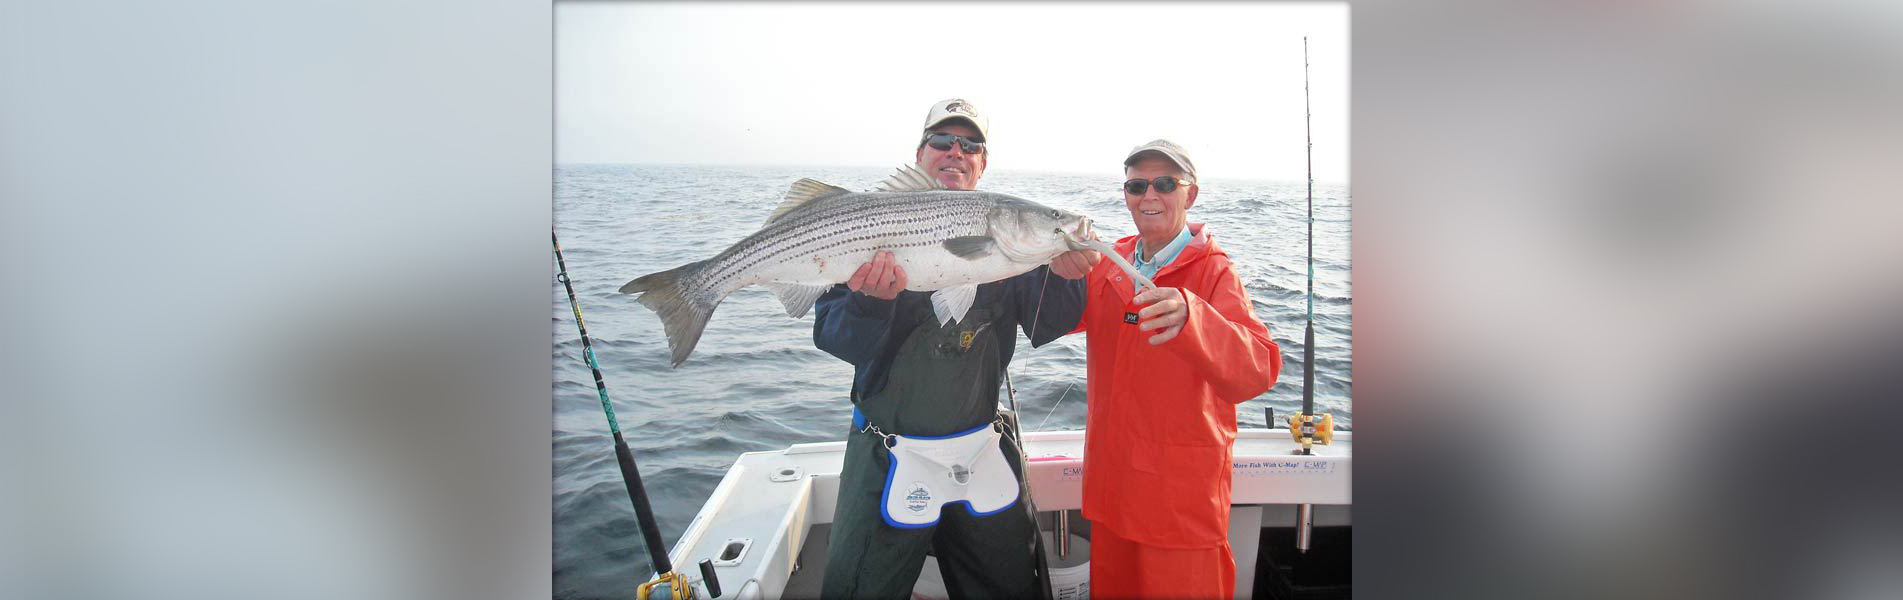 ELIZABETH MARIE SPORT FISHING - Slider4